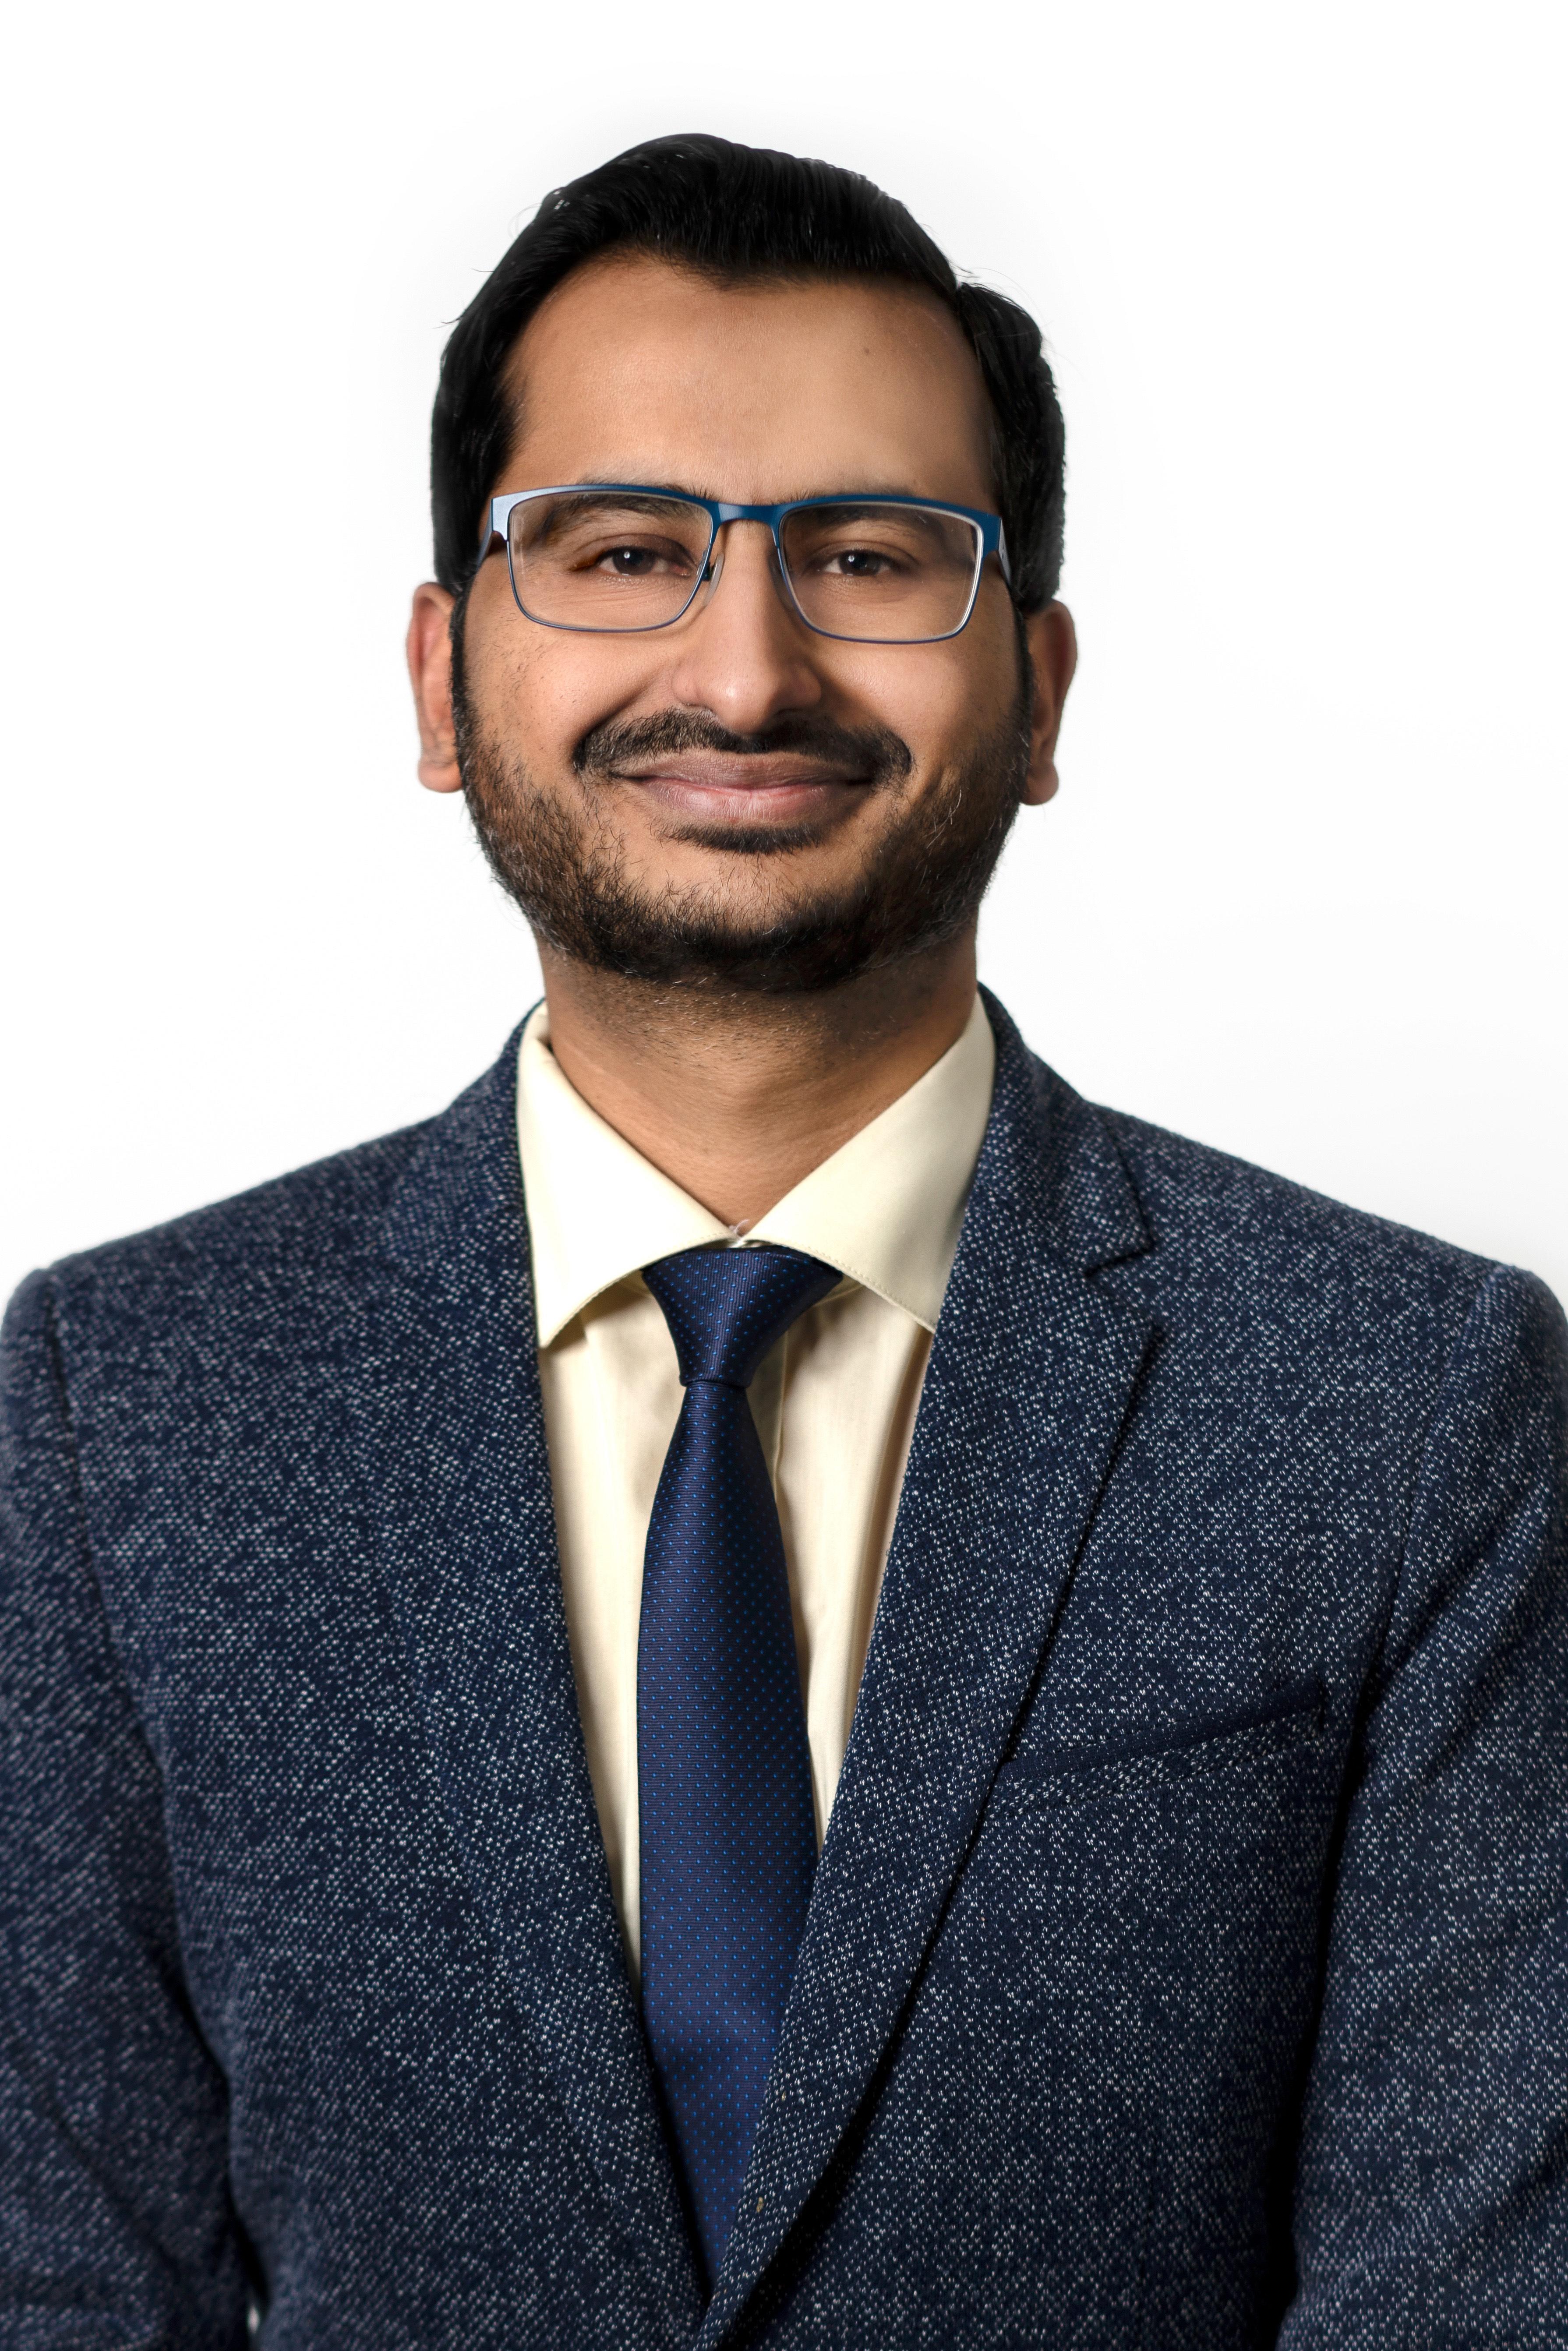 Mohammad Rizvi, PhD